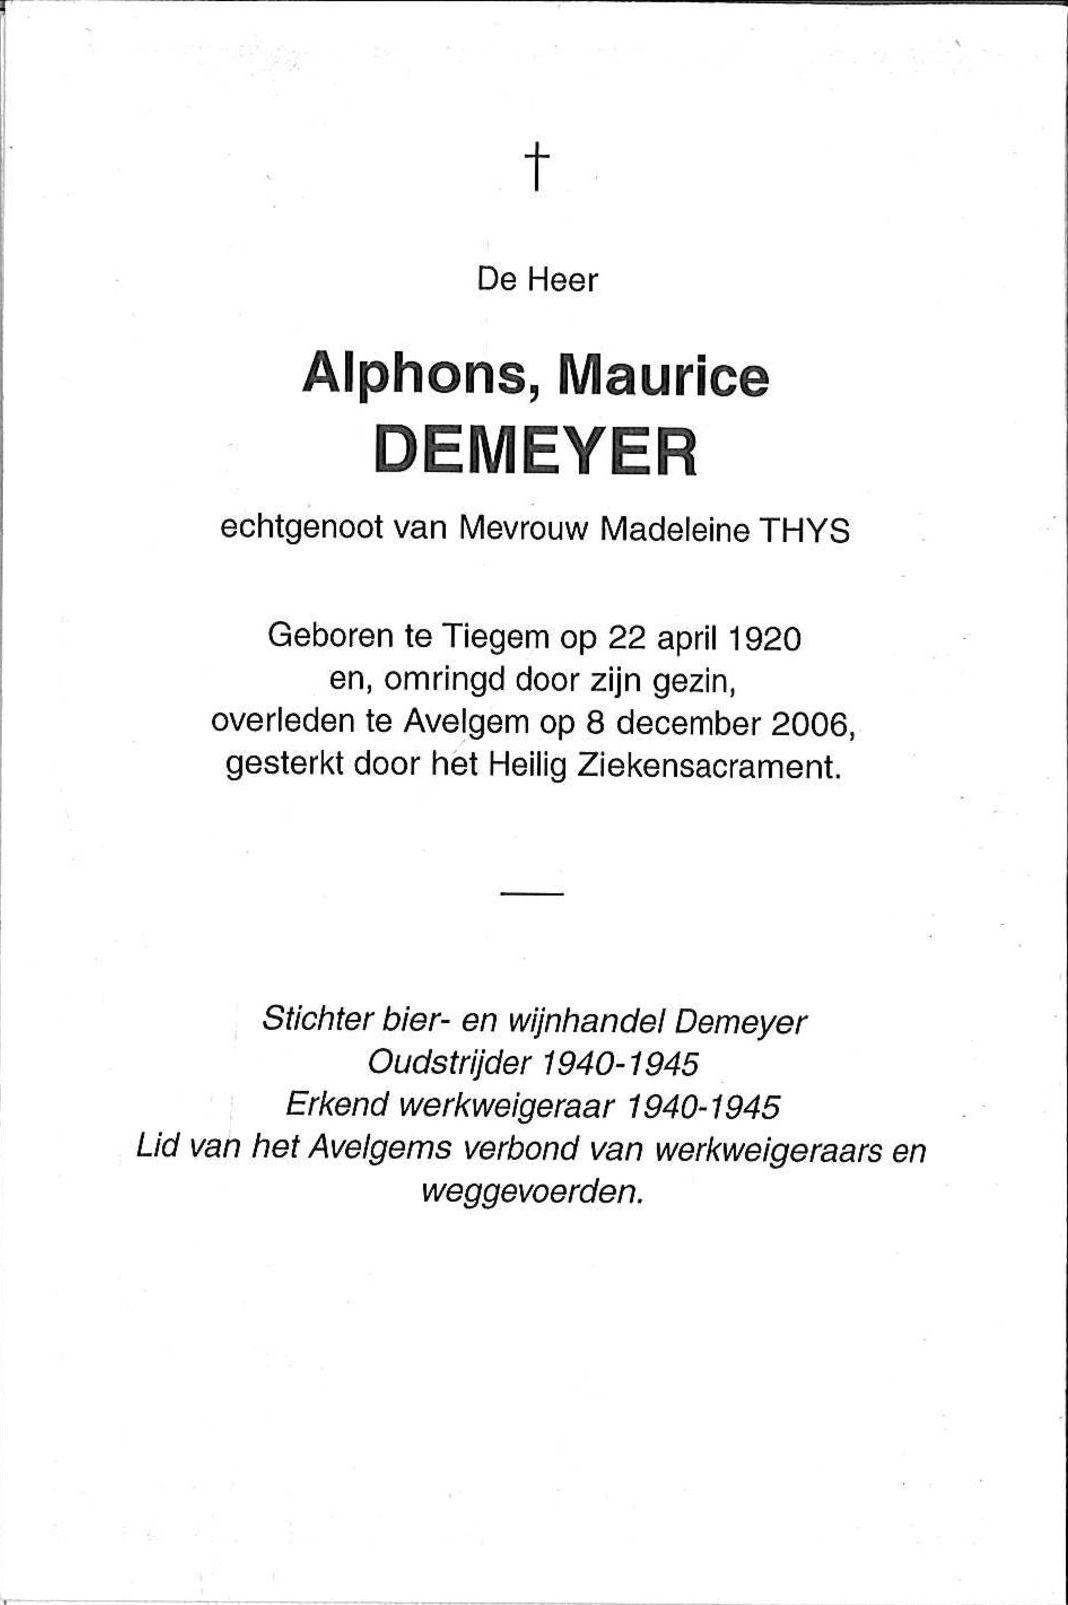 Alphonse,Maurice Demeyer